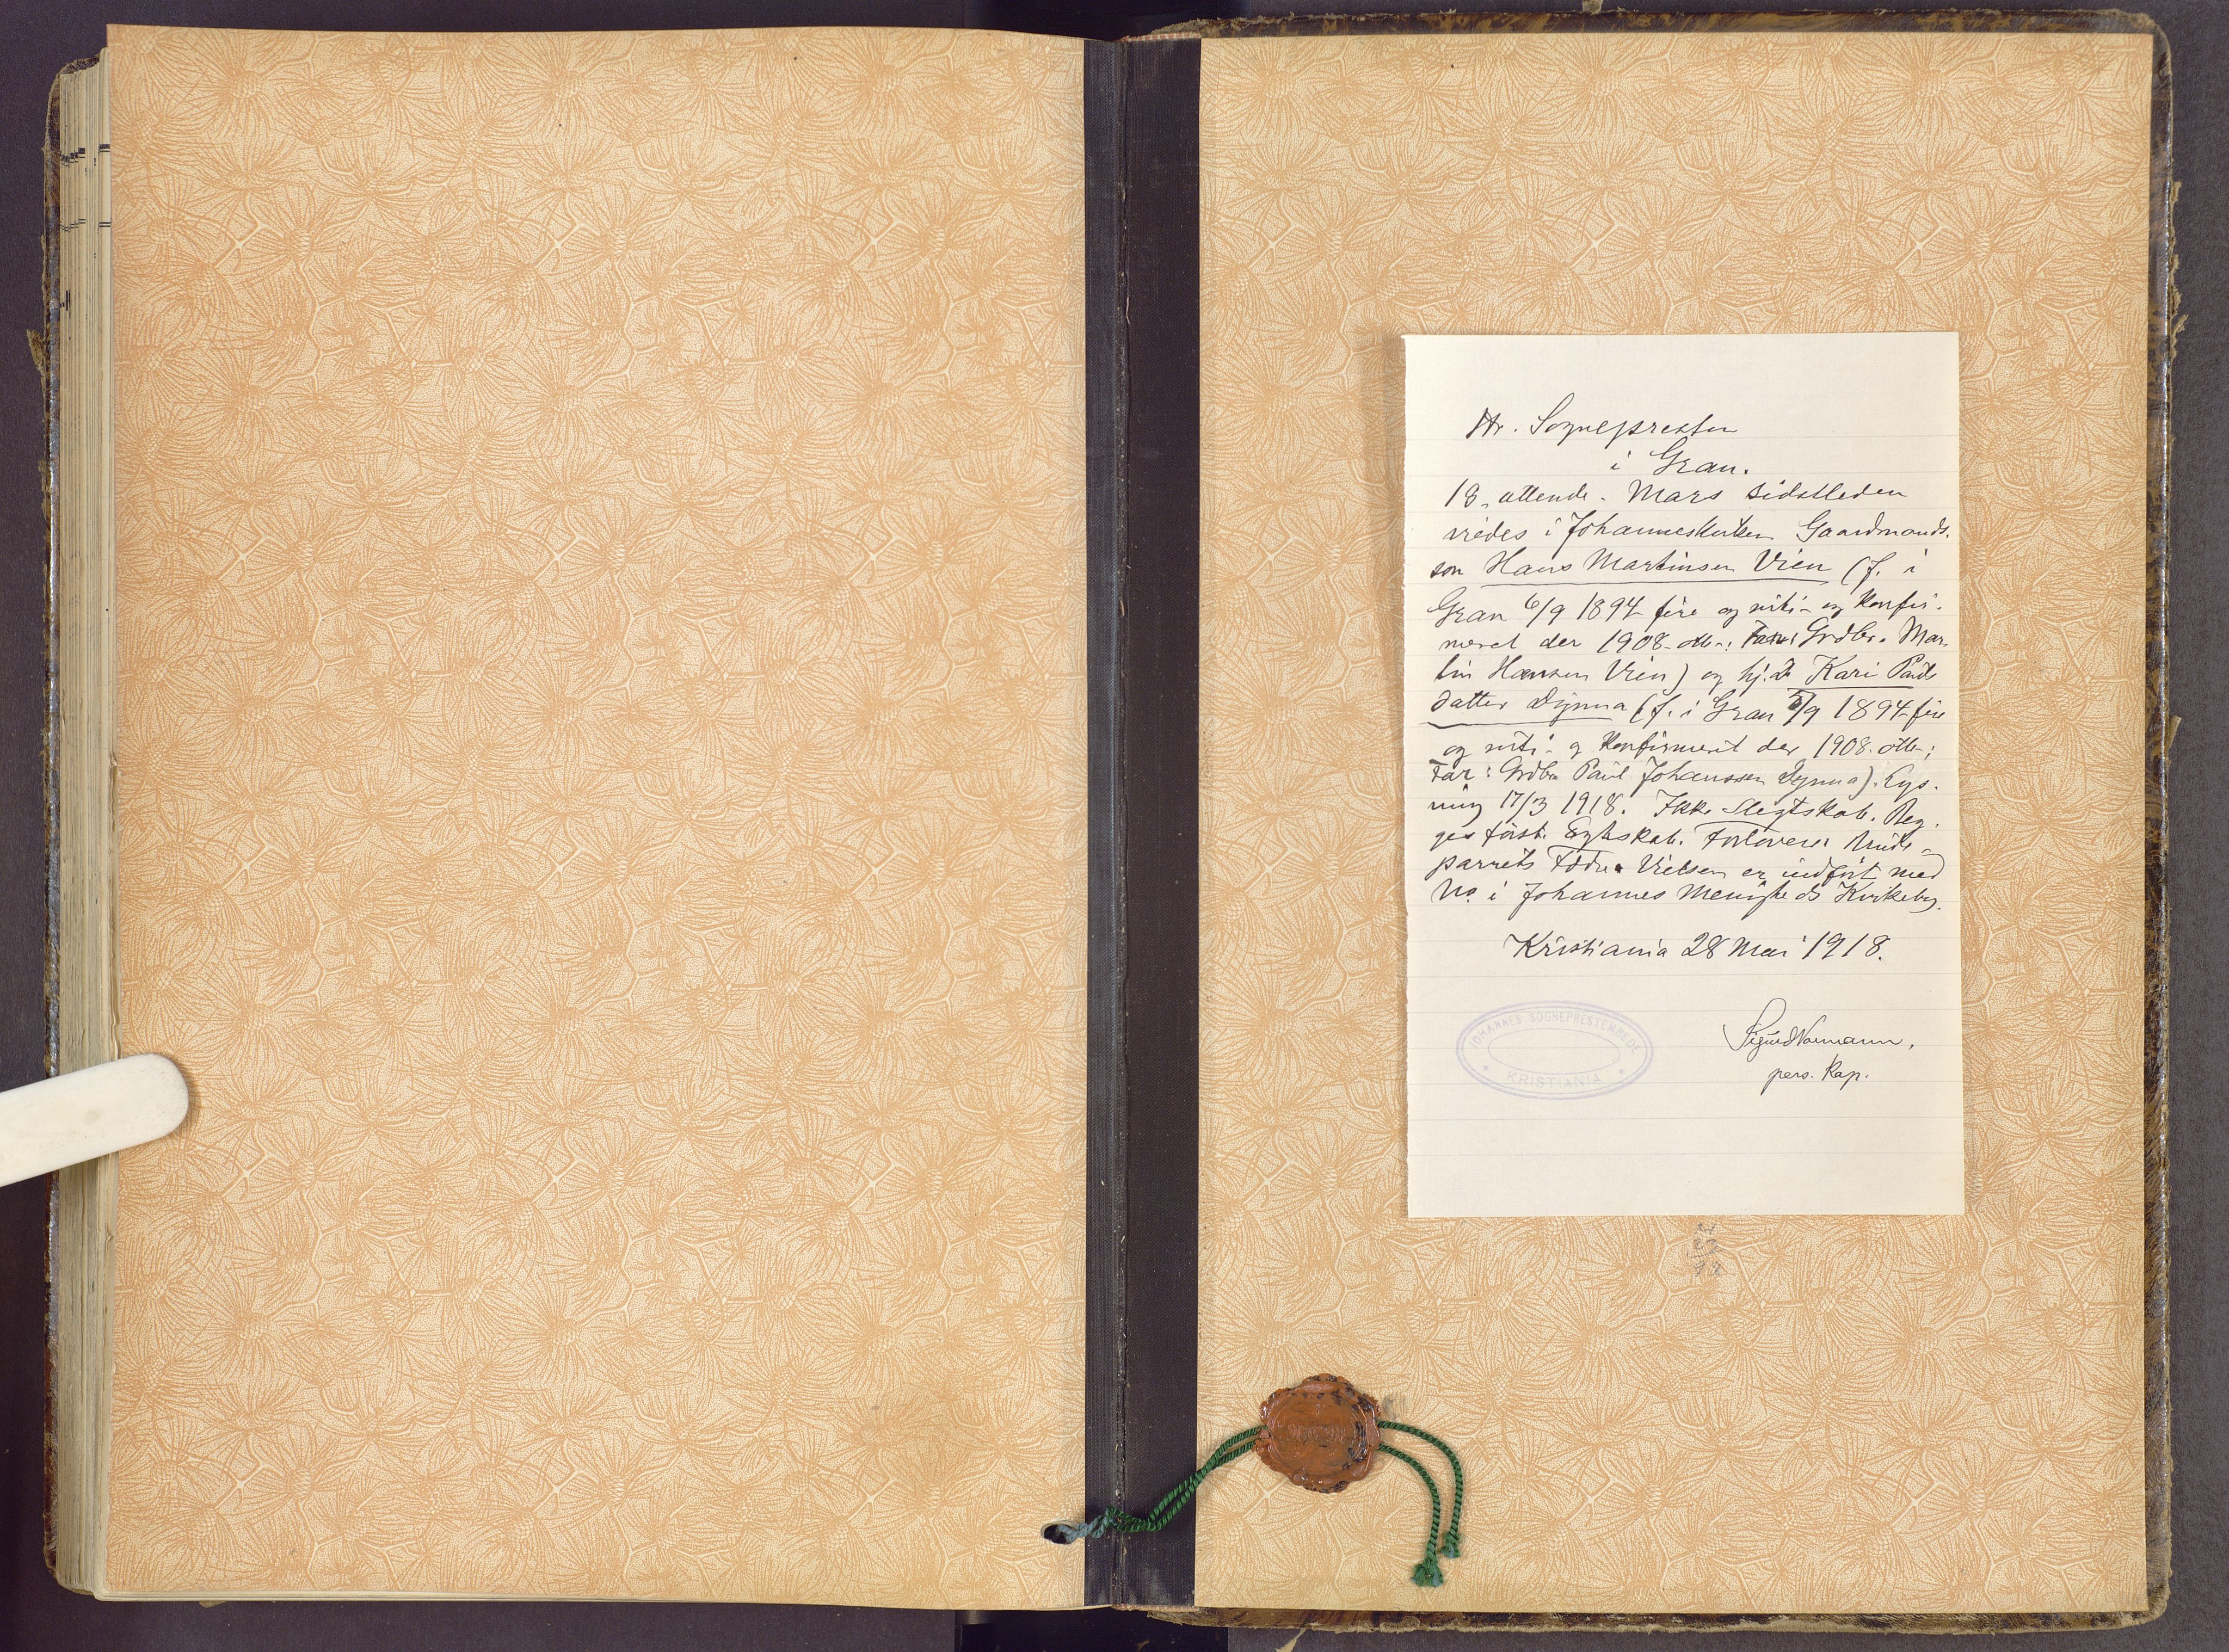 SAH, Gran prestekontor, Ministerialbok nr. 22, 1908-1918